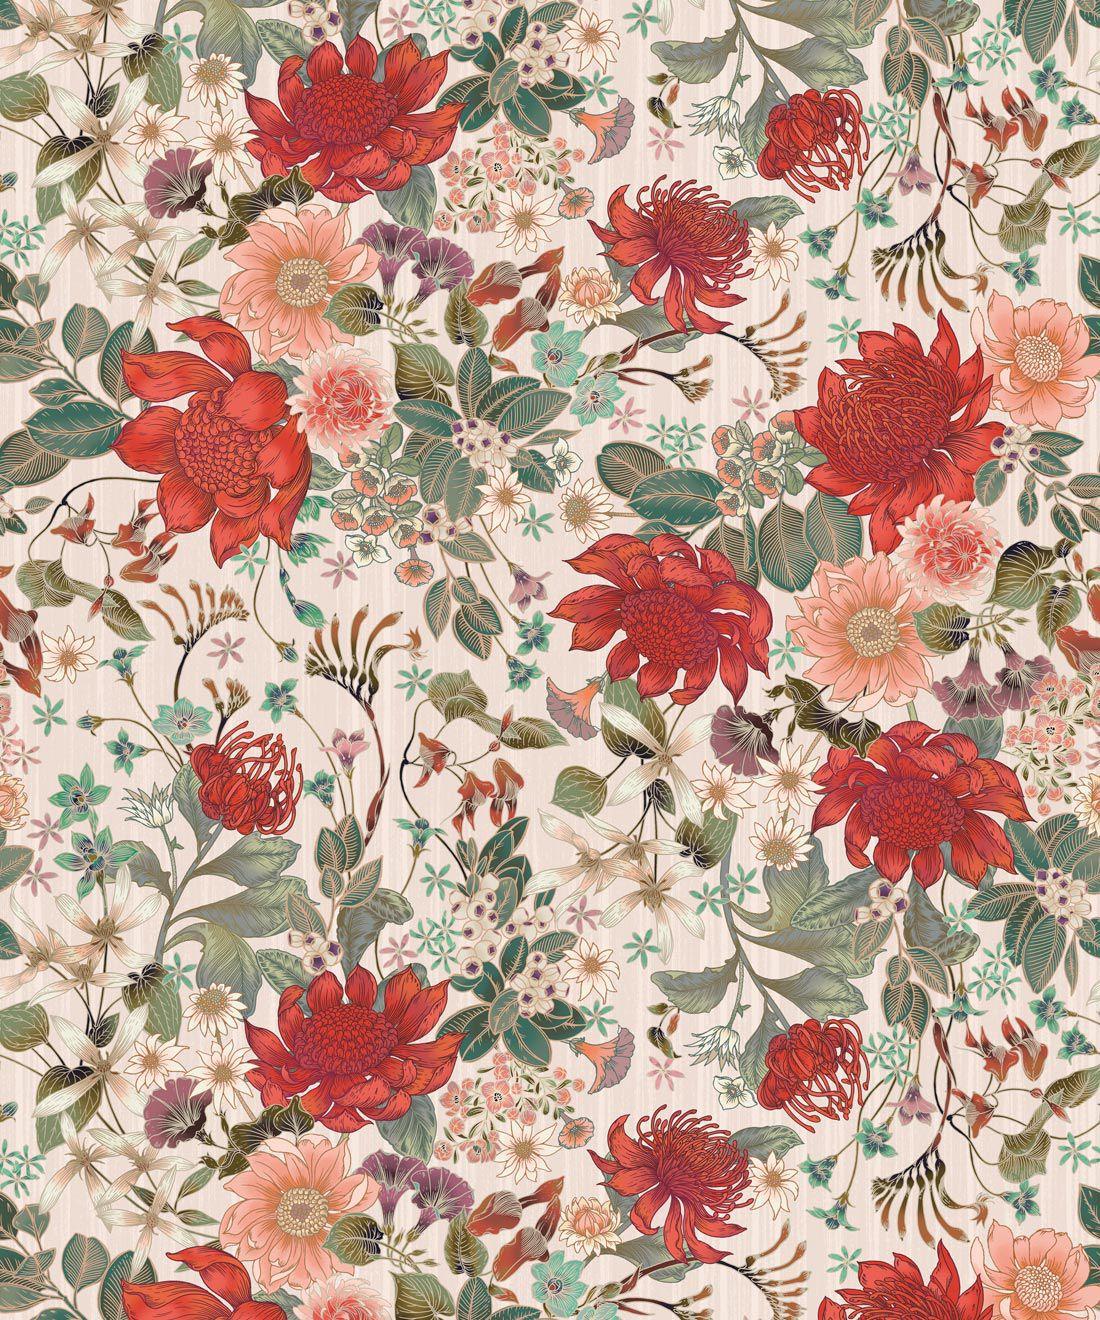 Bouquet Wallpaper • Eloise Short • Vintage Floral Wallpaper •Granny Chic Wallpaper • Grandmillennial Style Wallpaper •Alabaster •Swatch